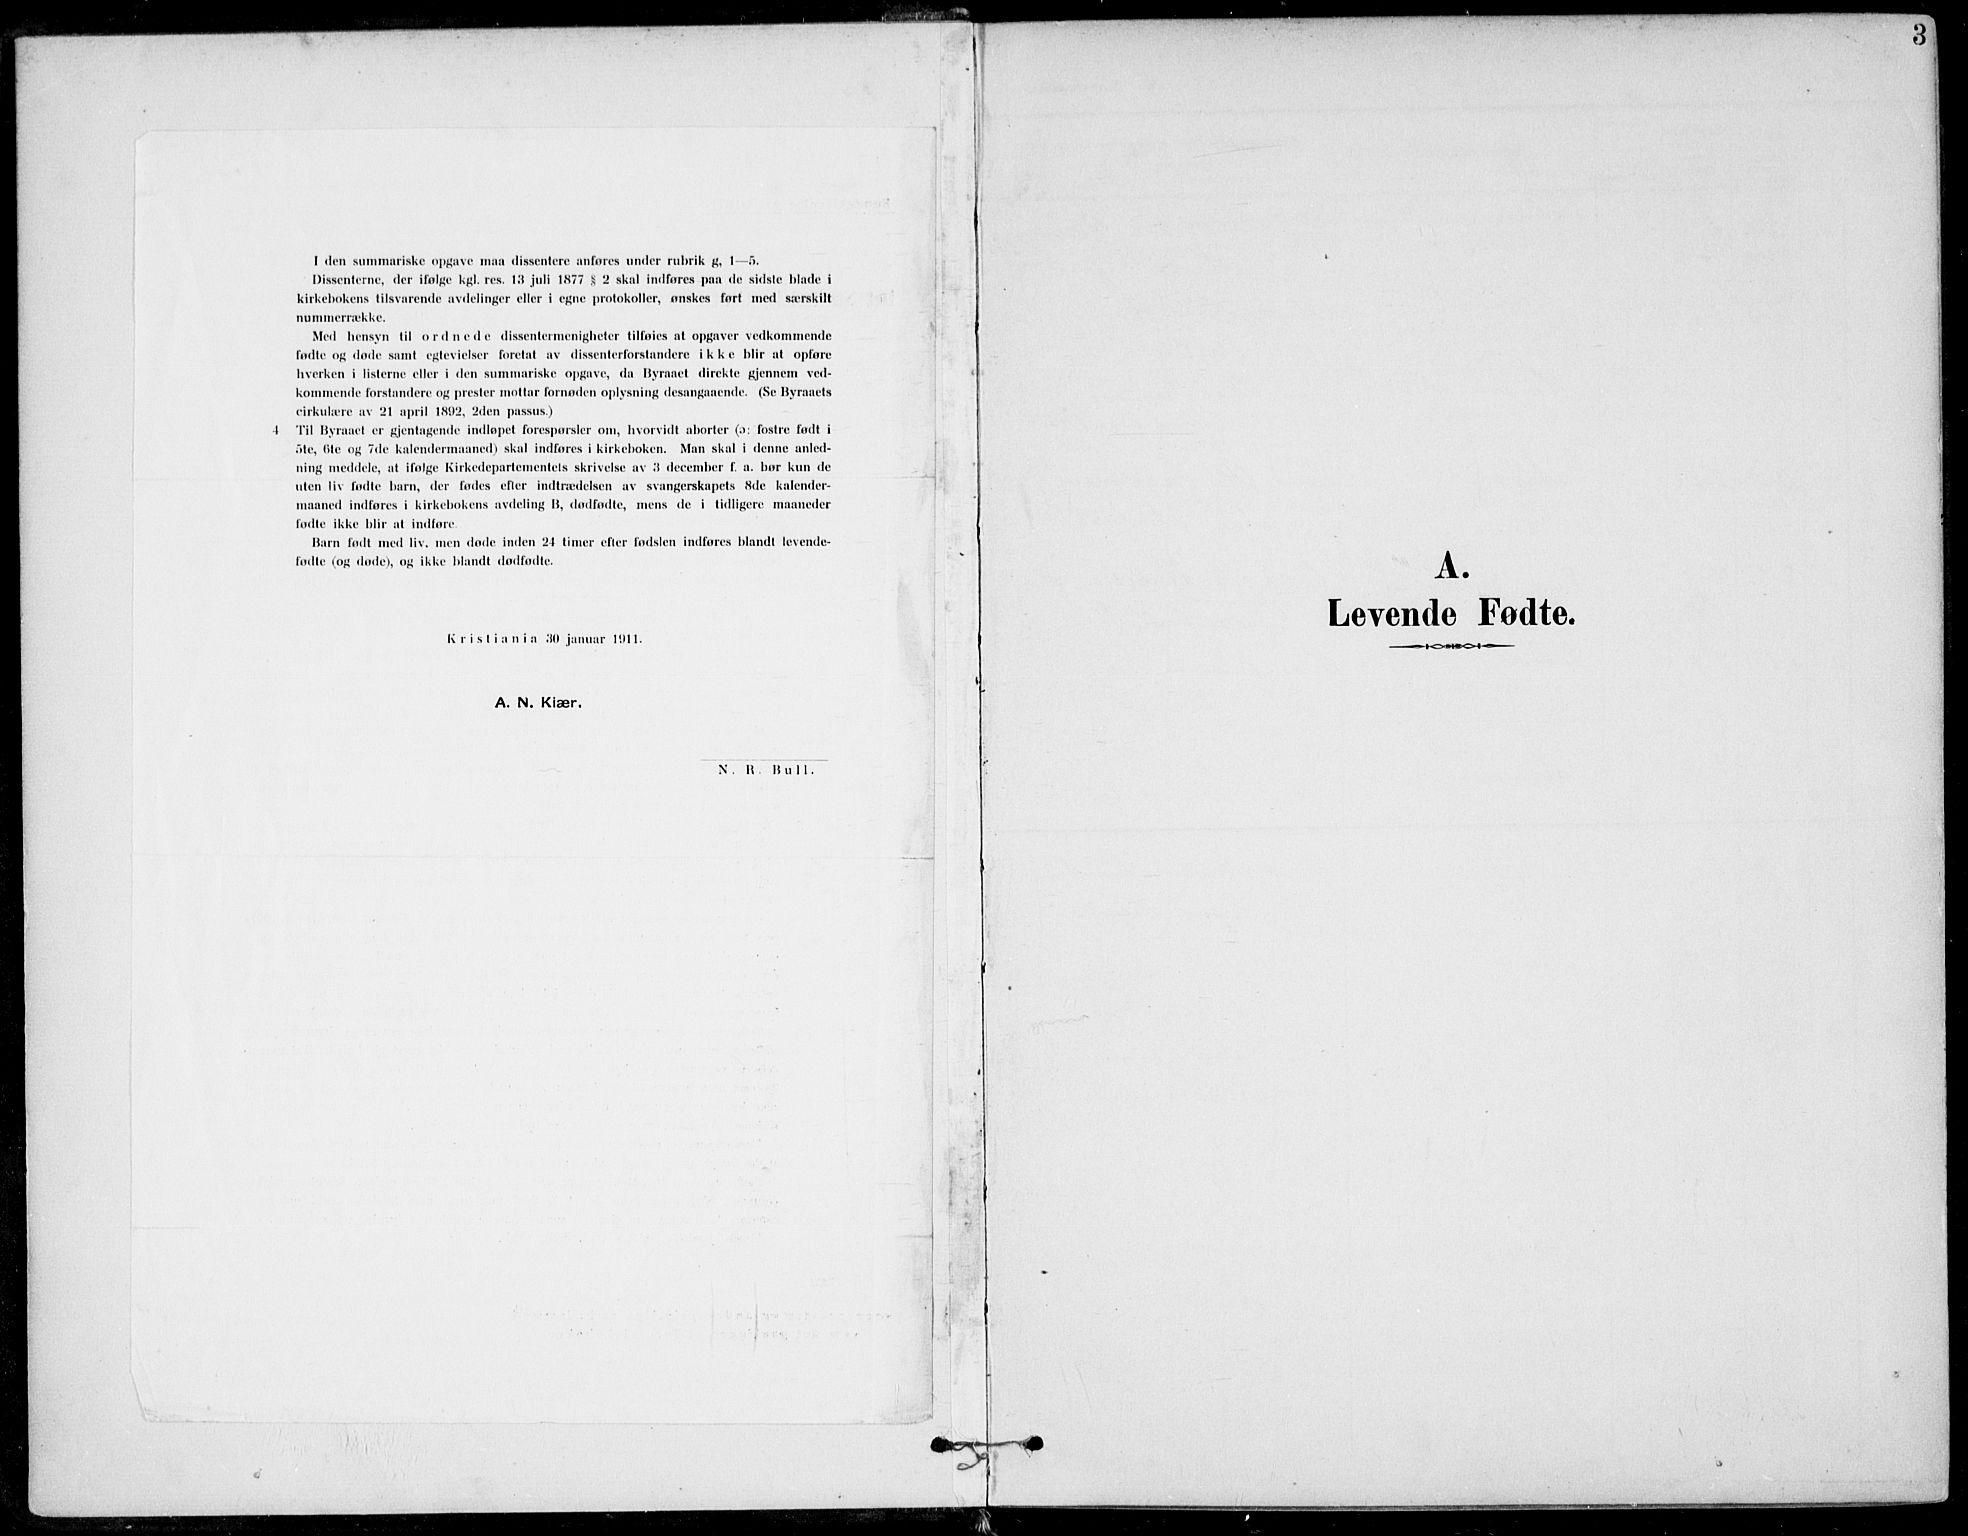 SAKO, Sigdal kirkebøker, F/Fb/L0002: Parish register (official) no. II 2, 1901-1914, p. 3